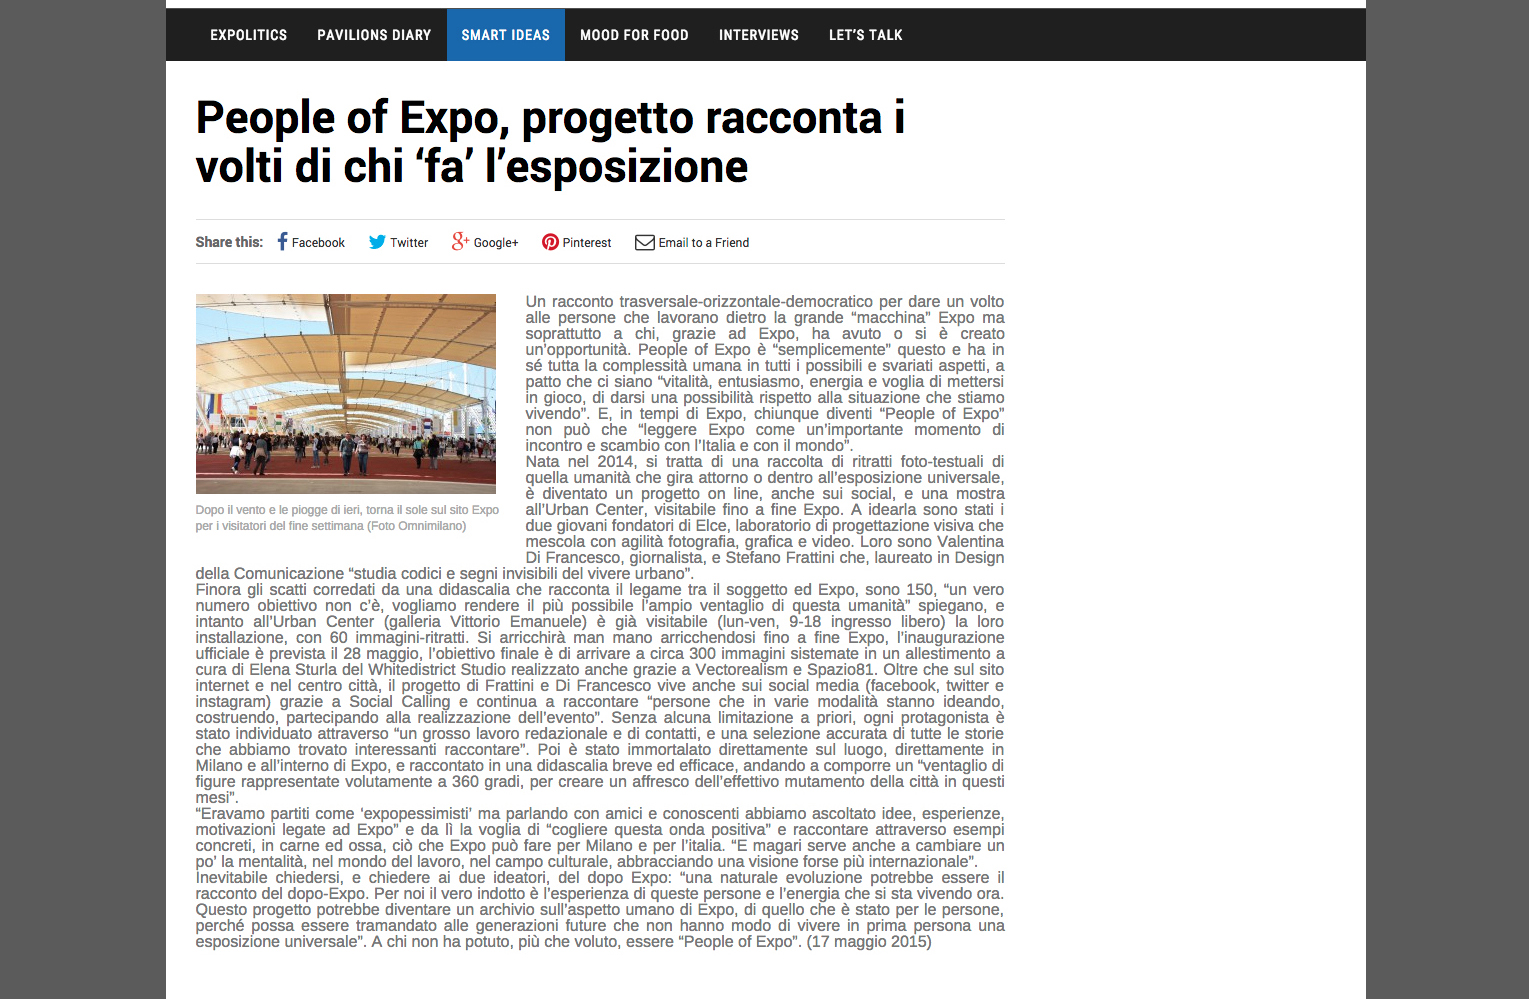 Daily Expo